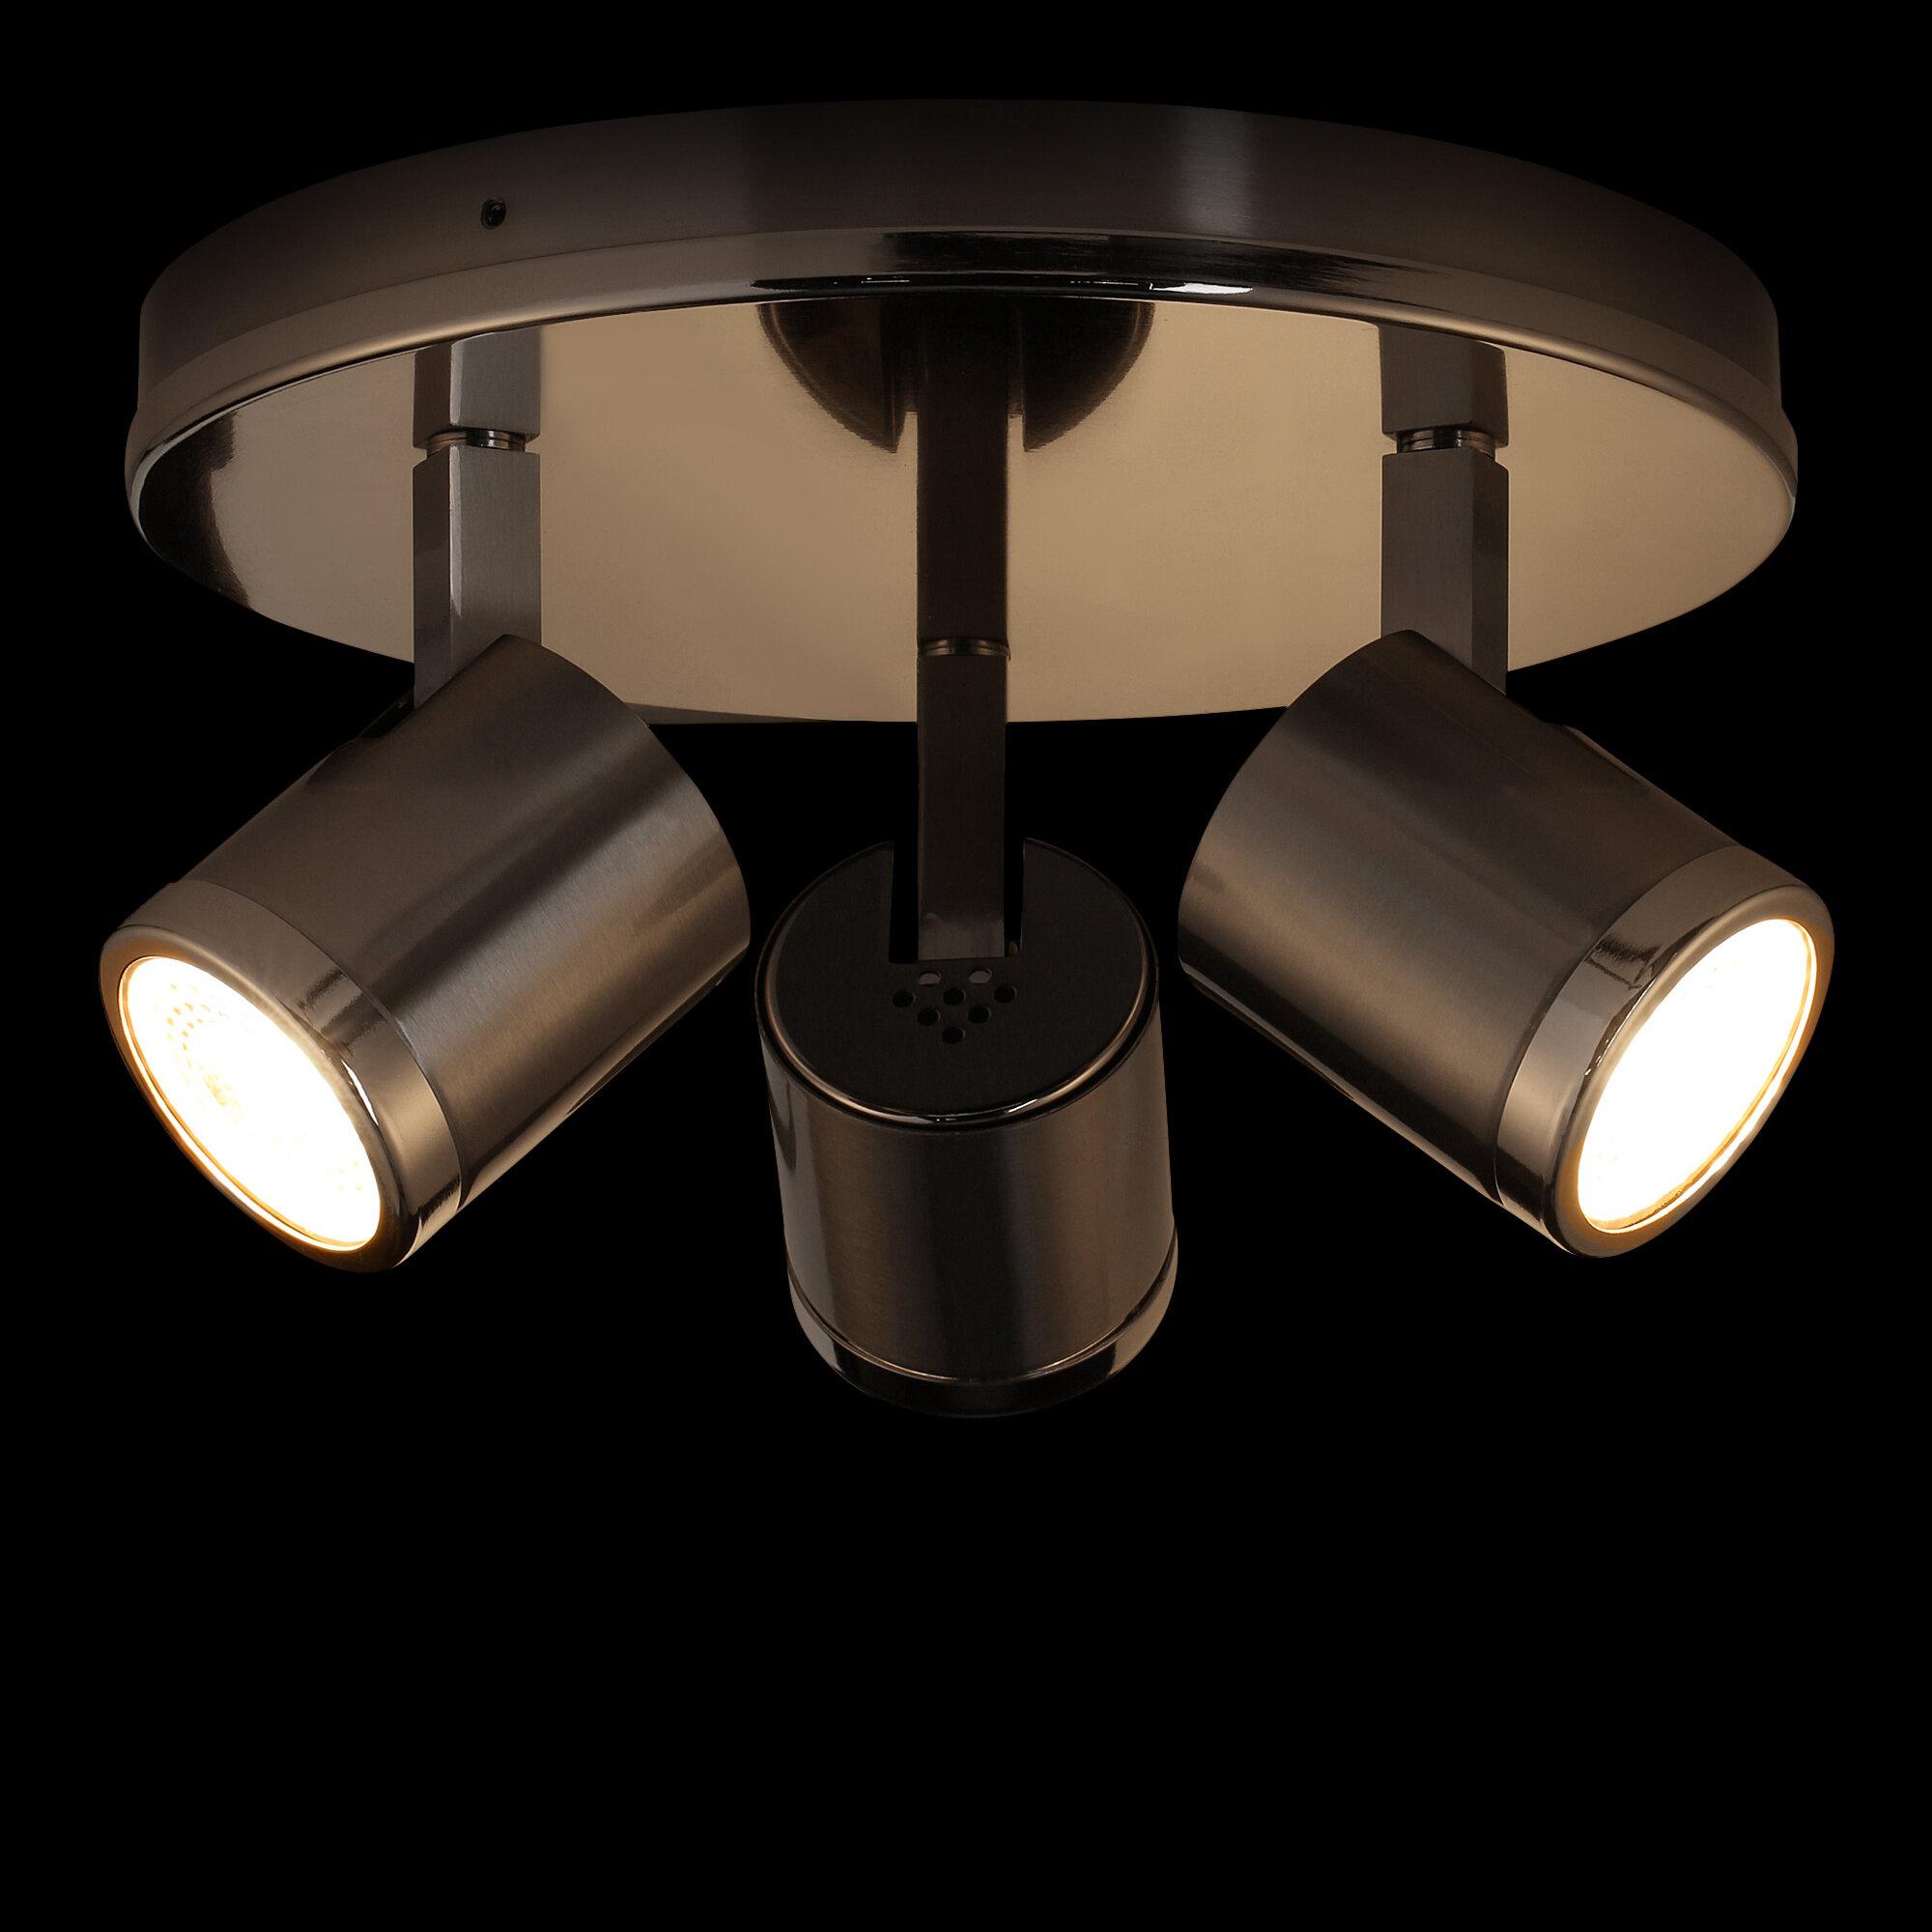 Mancini 3 Light Led Ceiling Spotlight